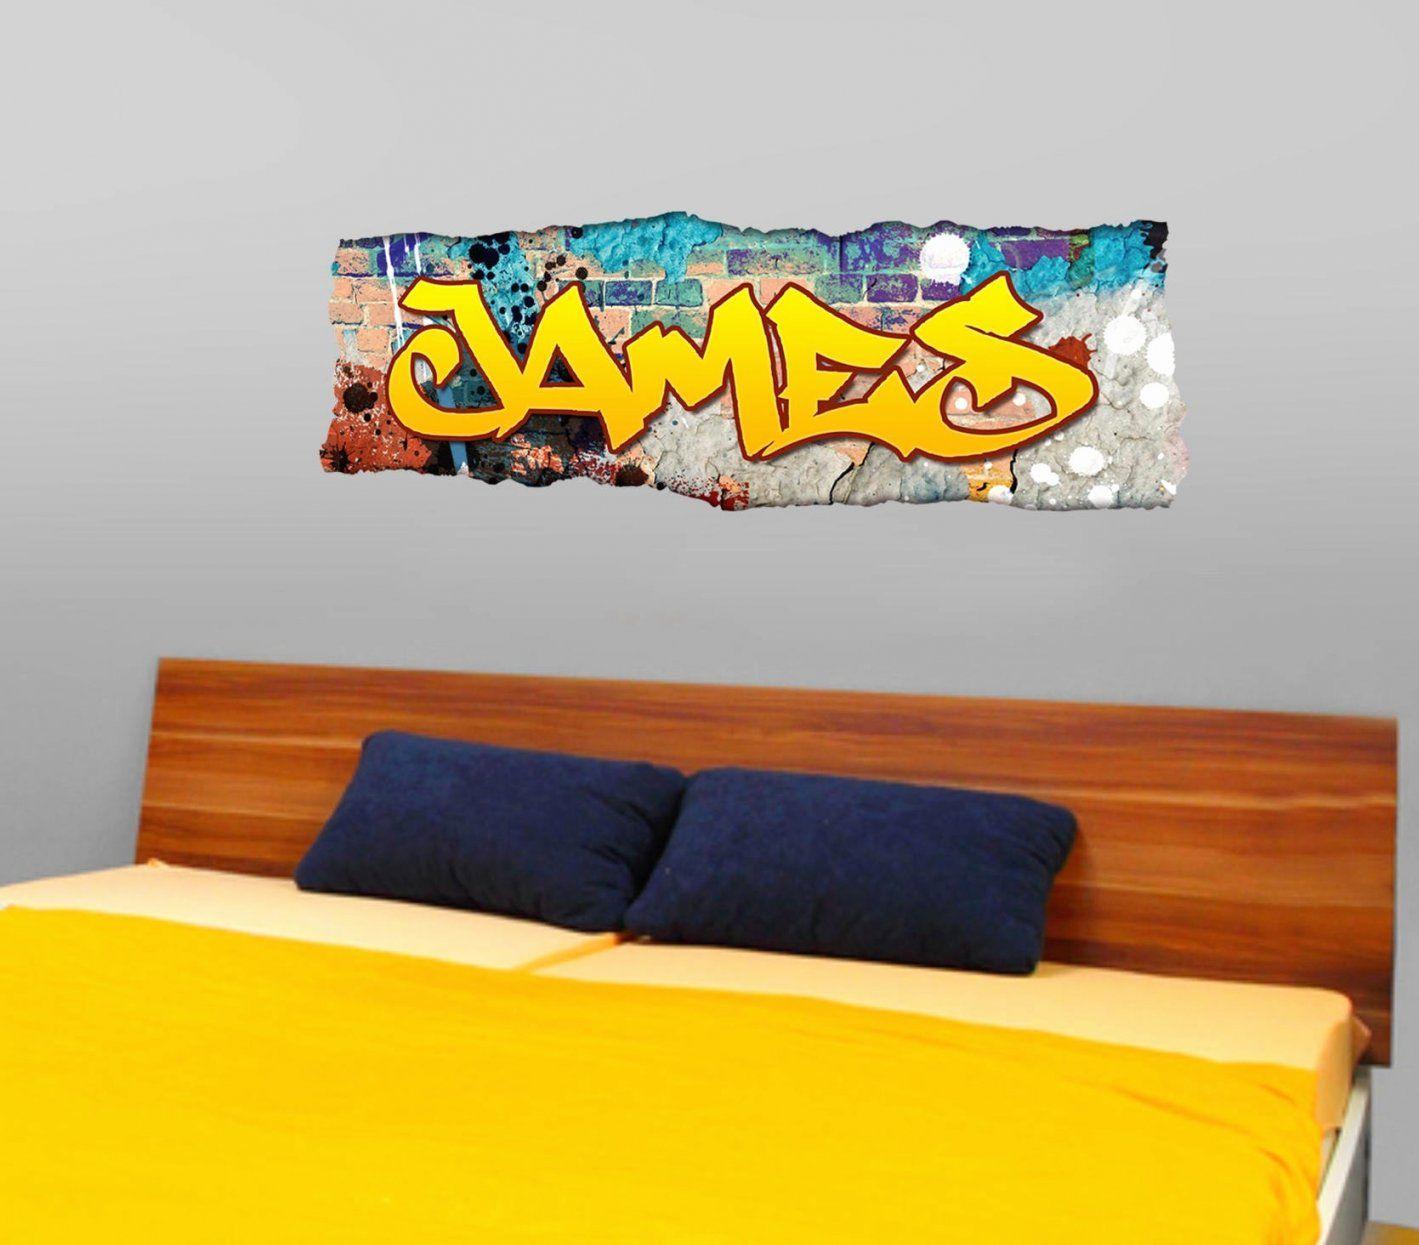 Wandtattoo Jugendzimmer Graffiti Frisch Intelligente Ideen von Wandtattoo Jugendzimmer Jungen Graffiti Bild